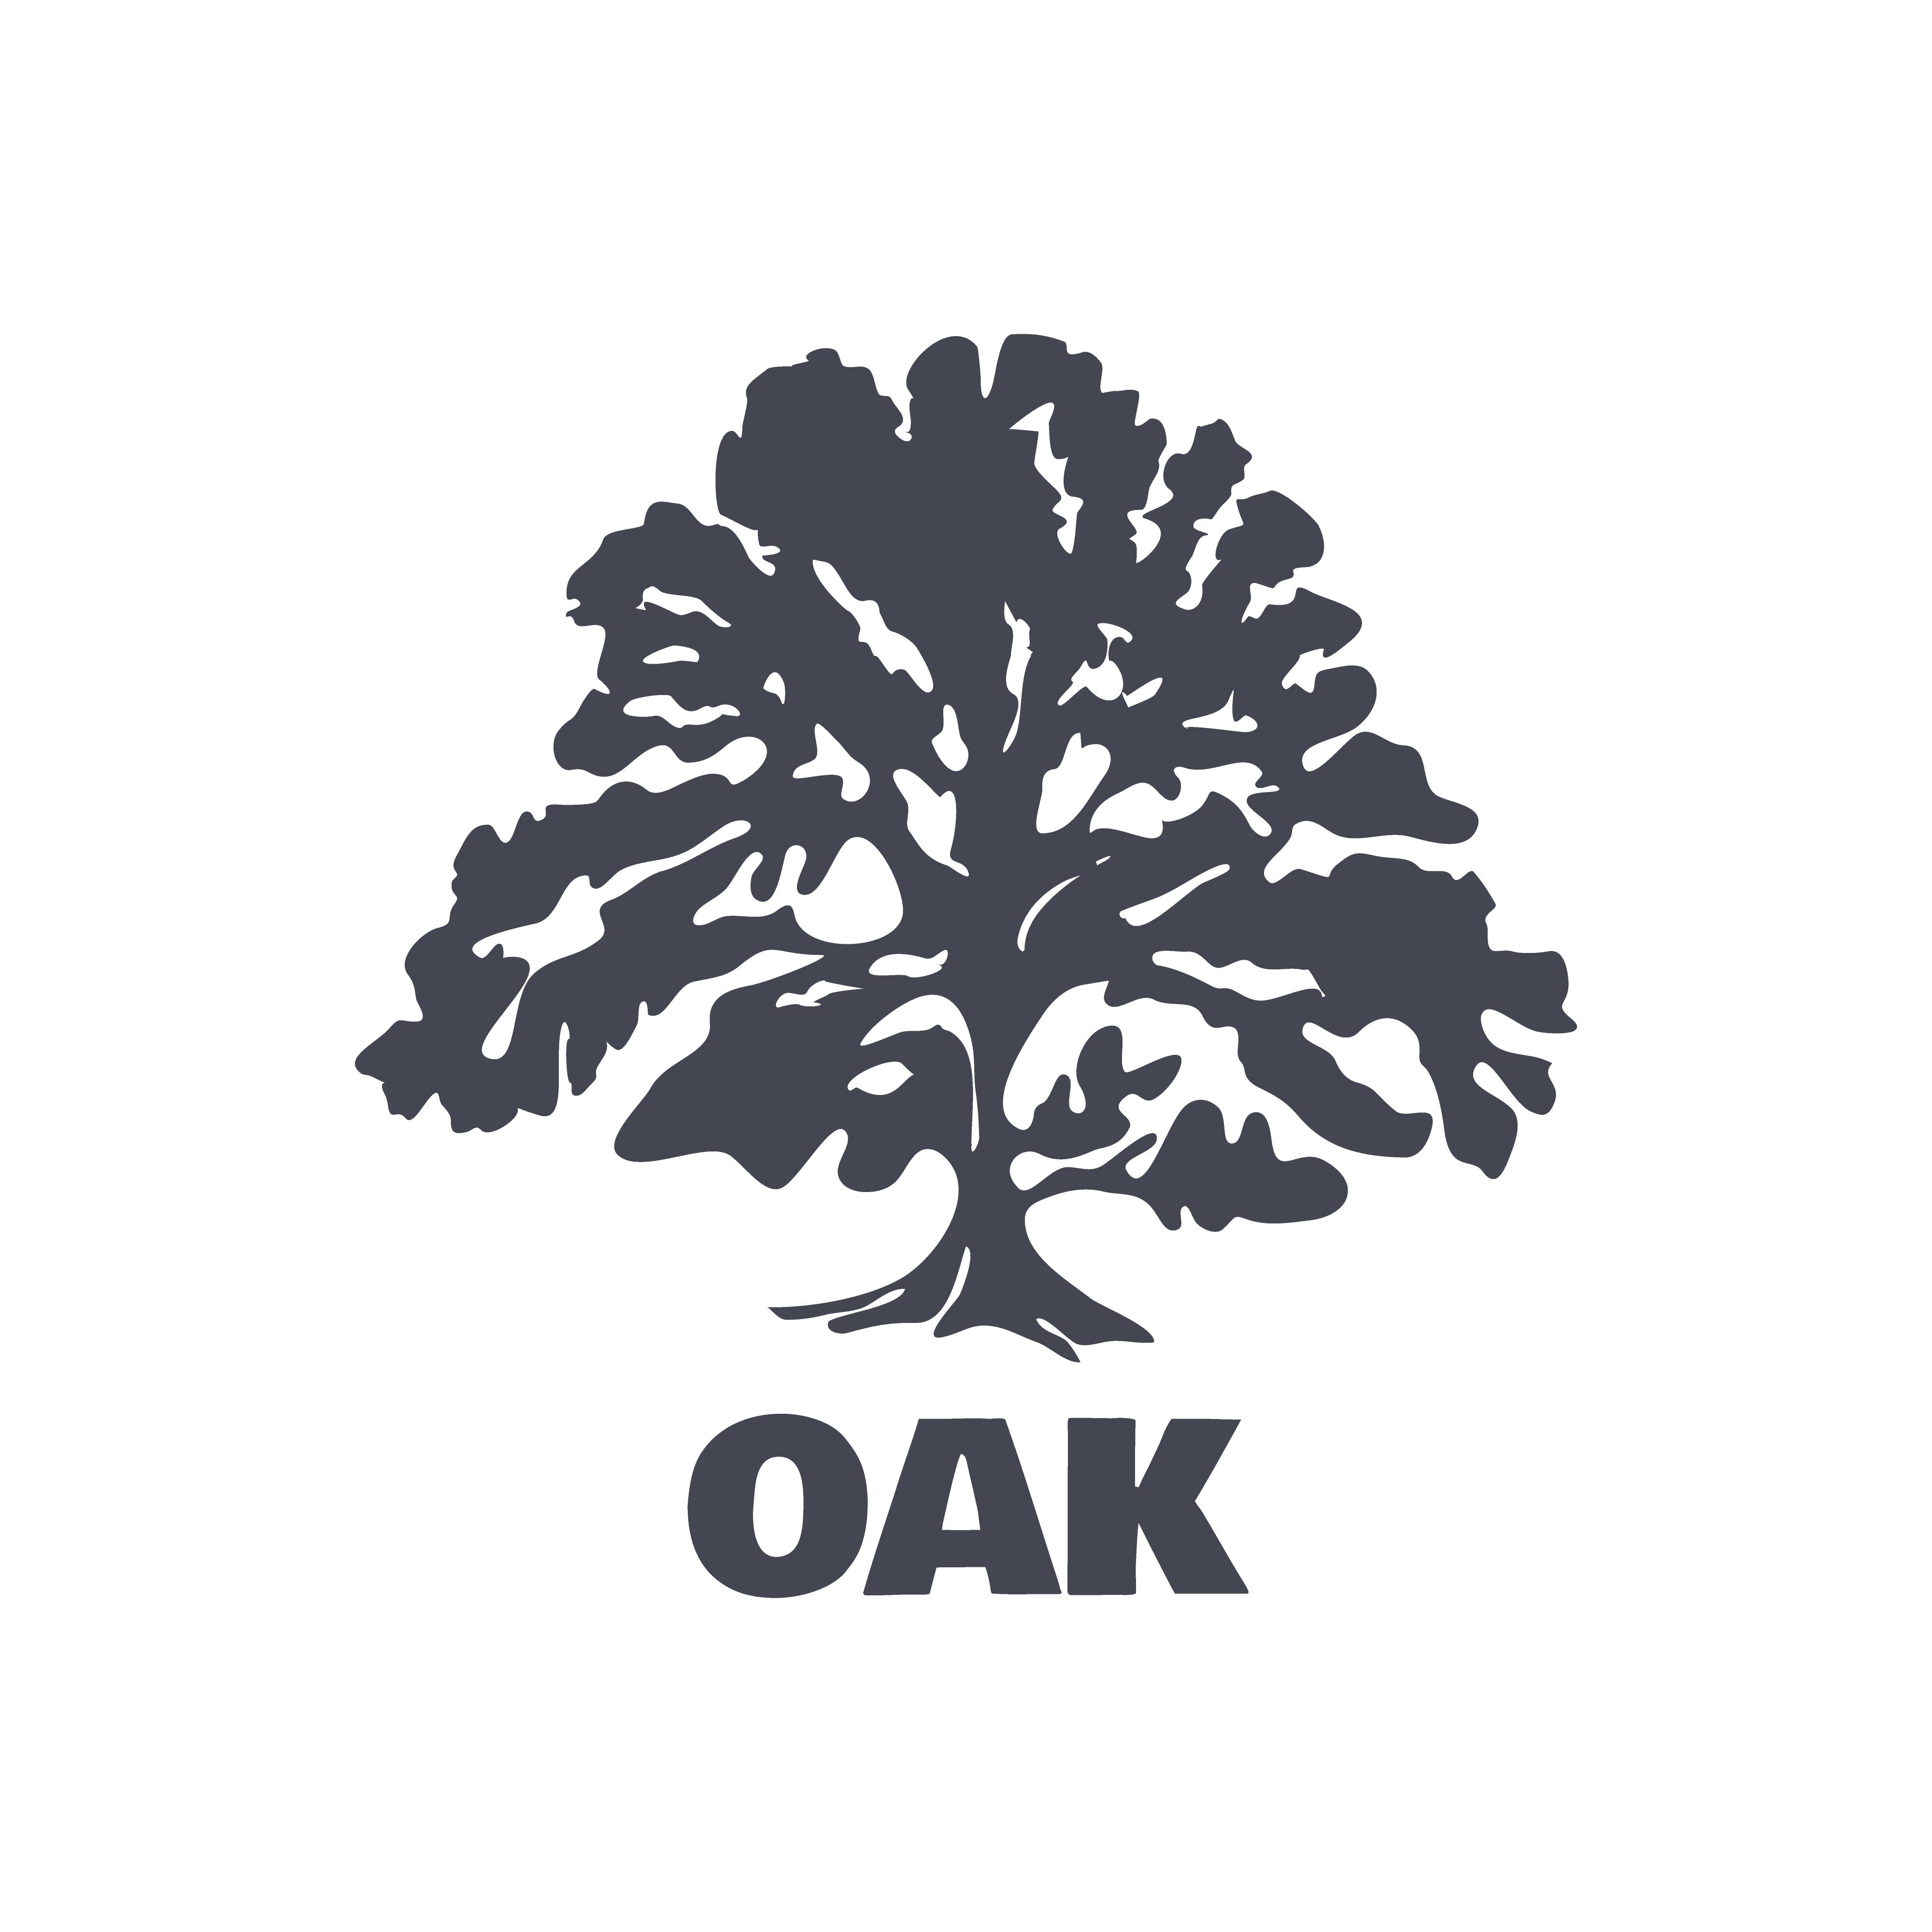 Oak Ebanisteria Carpinteria S.l